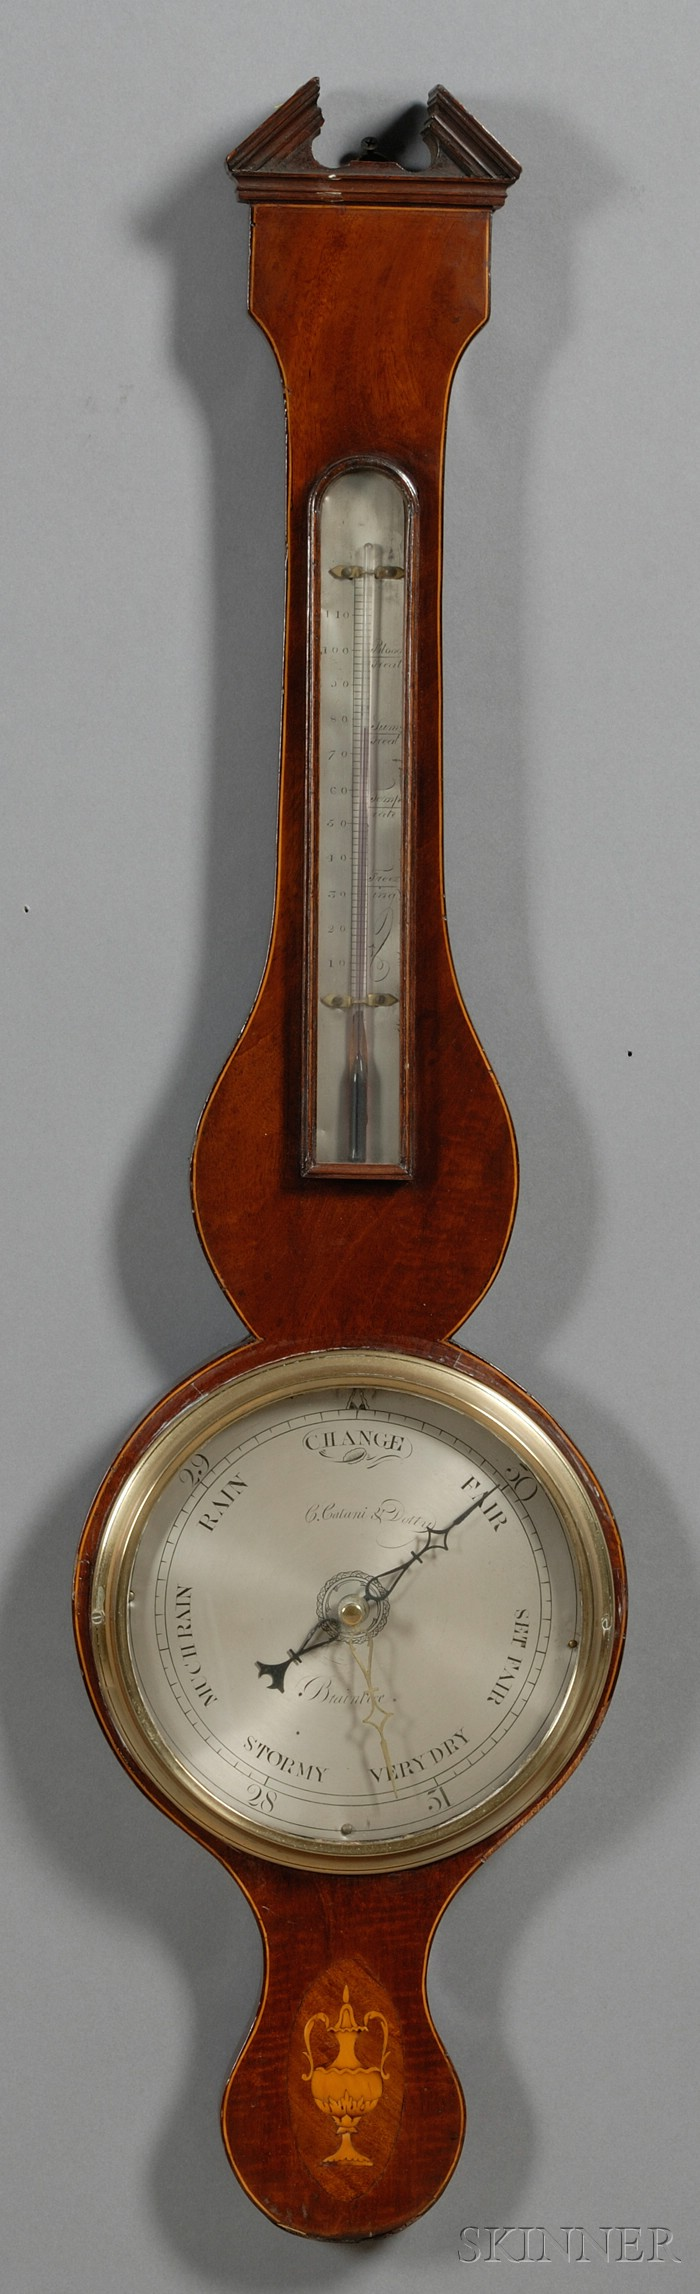 Inlaid Mahogany Veneer Wheel Barometer